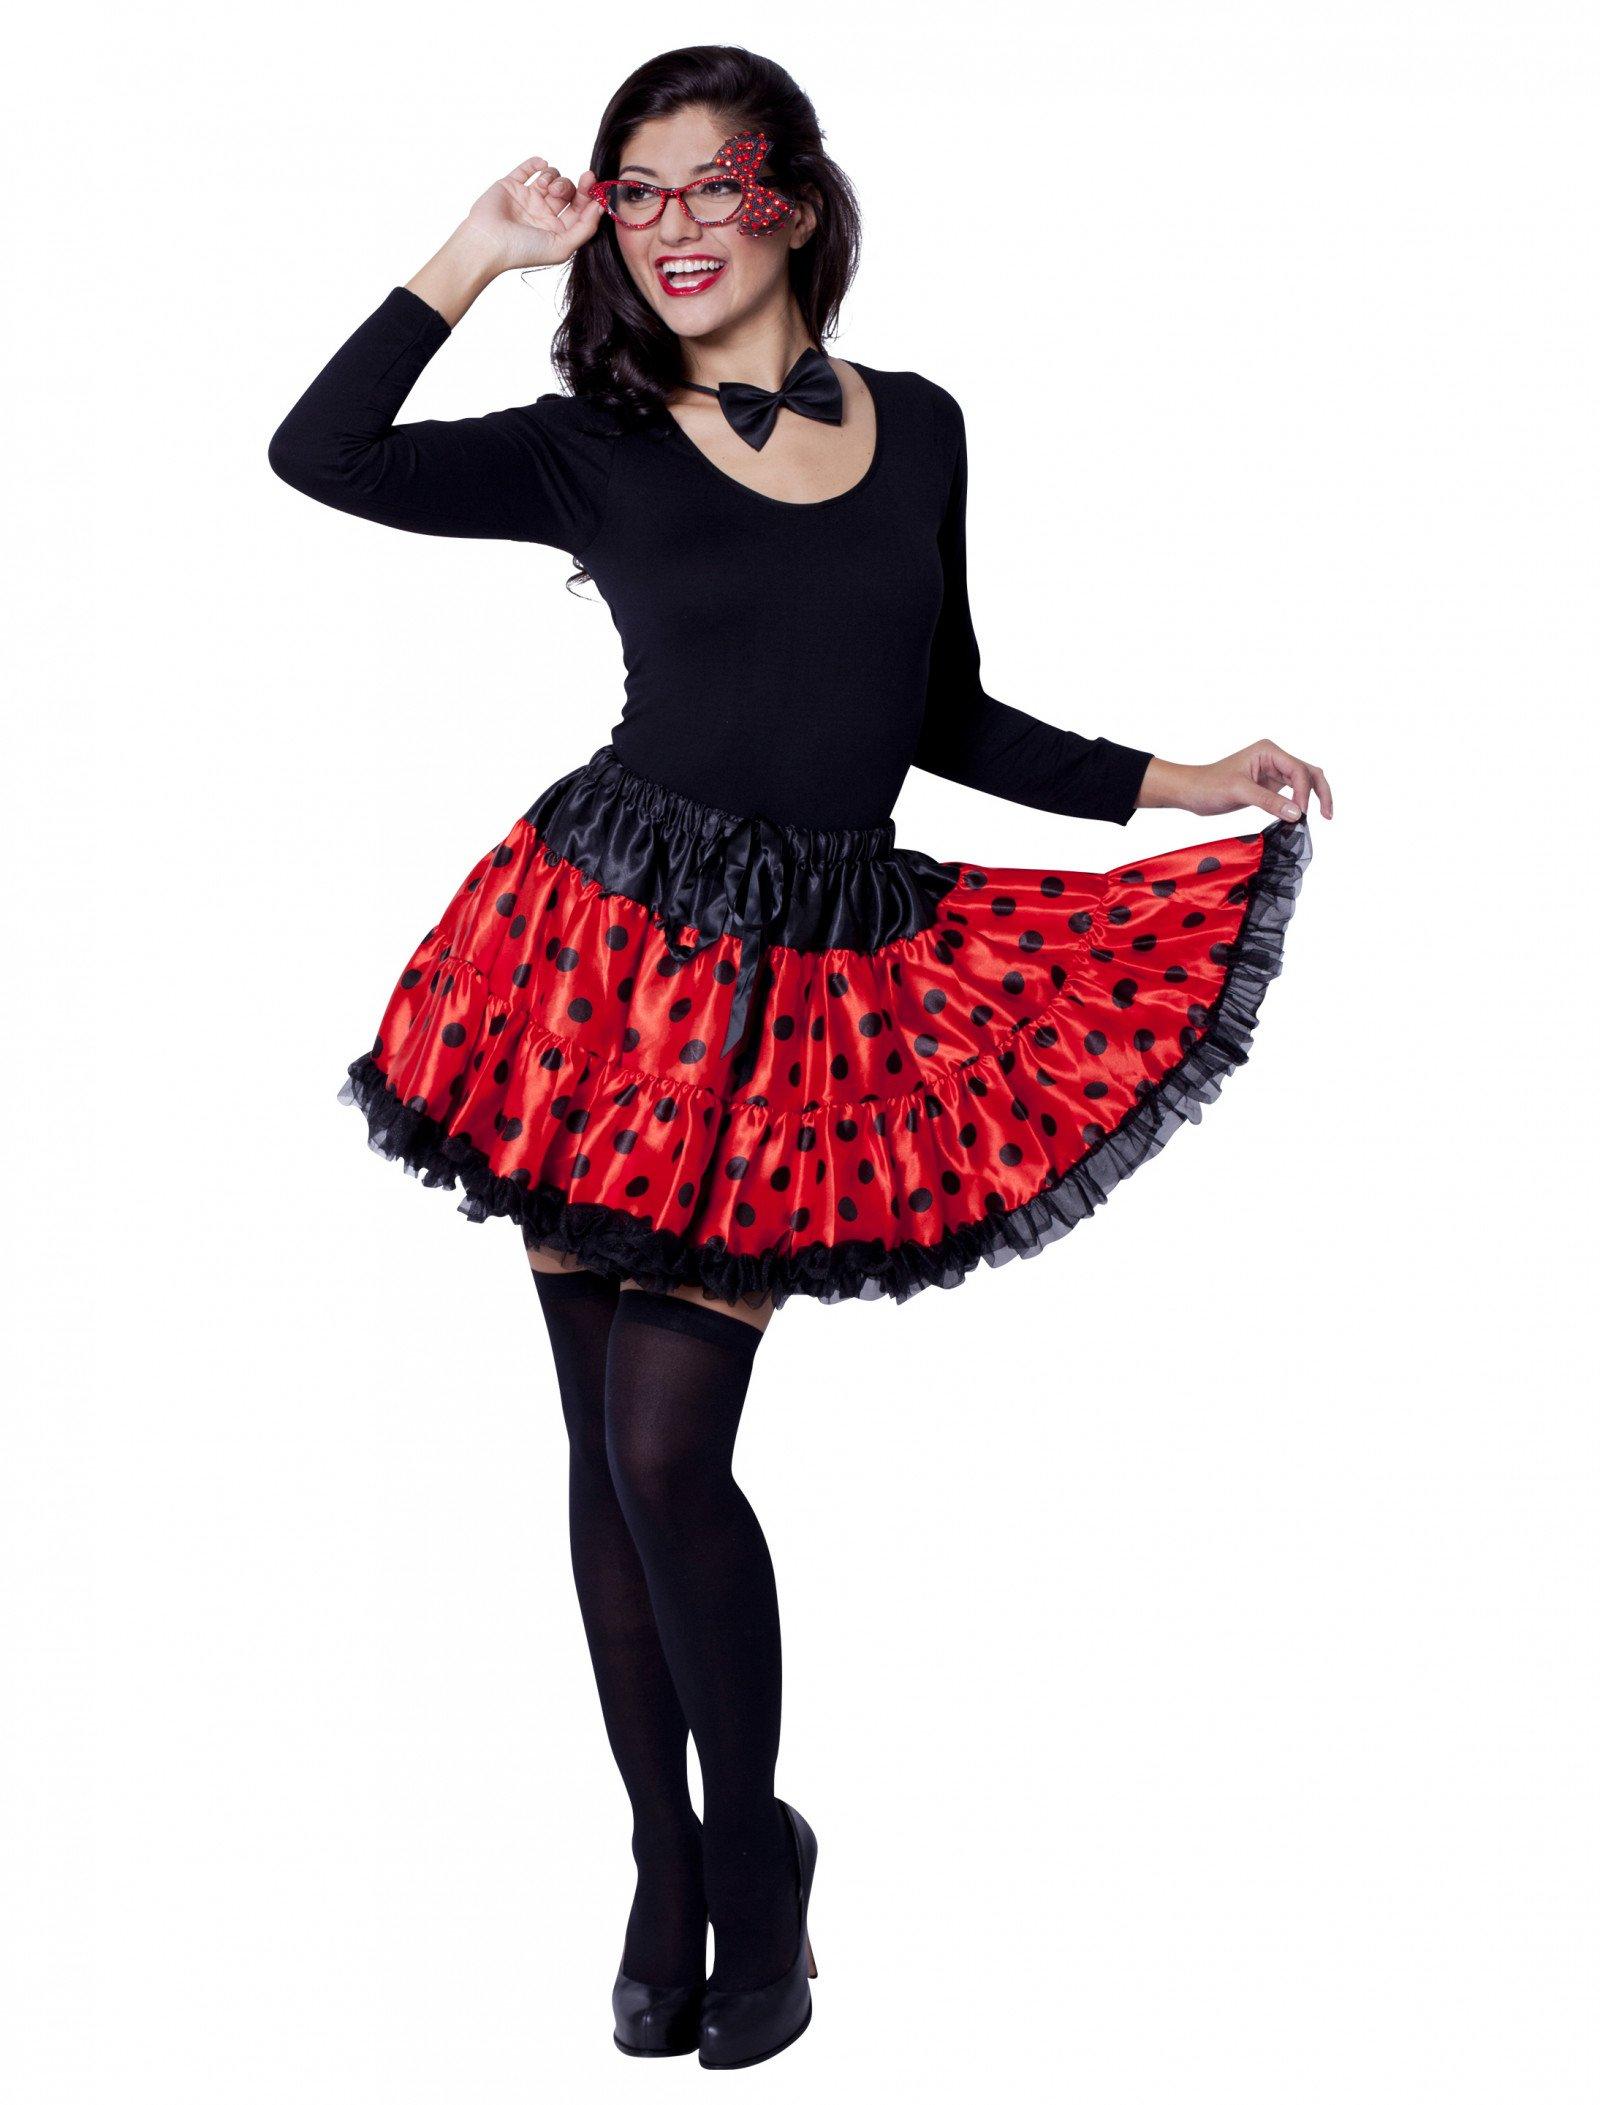 Petticoat Marienkäfer Schwarz/rot innen Marienkäfer Fasching Schminken